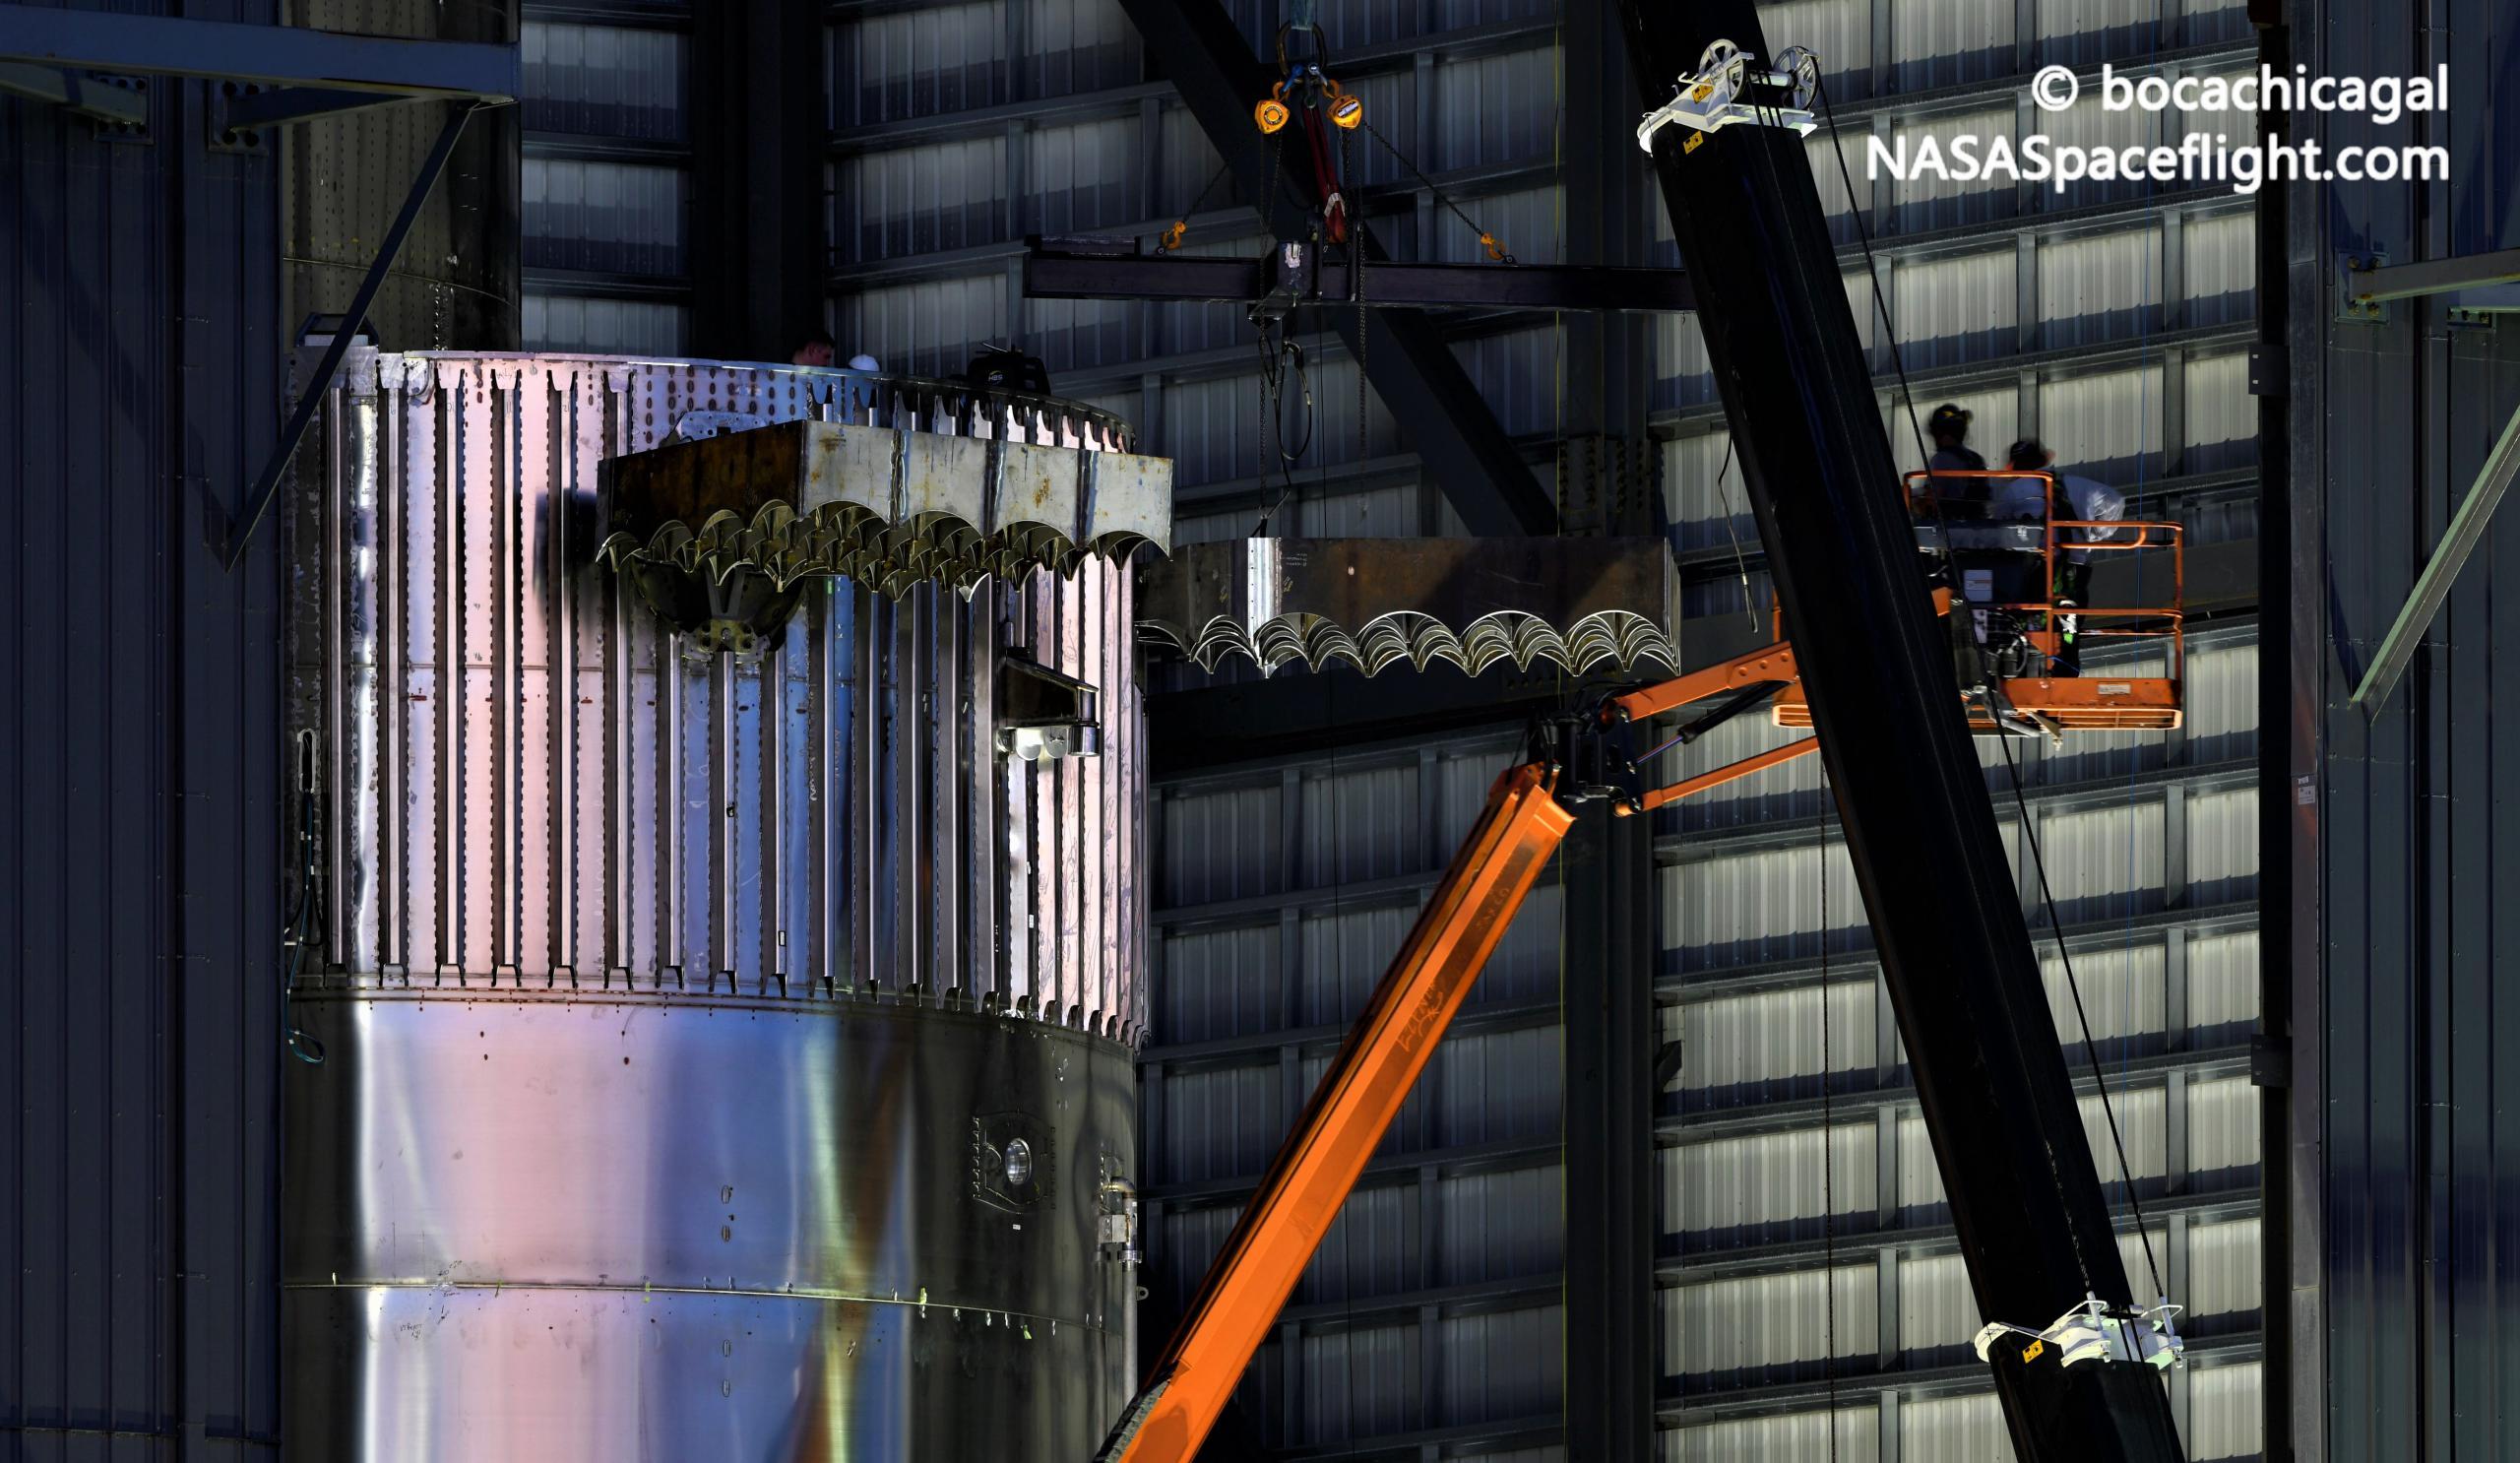 Starship Boca Chica 080121 (NASASpaceflight – bocachicagal) B4 grid fin install 1 crop (c)